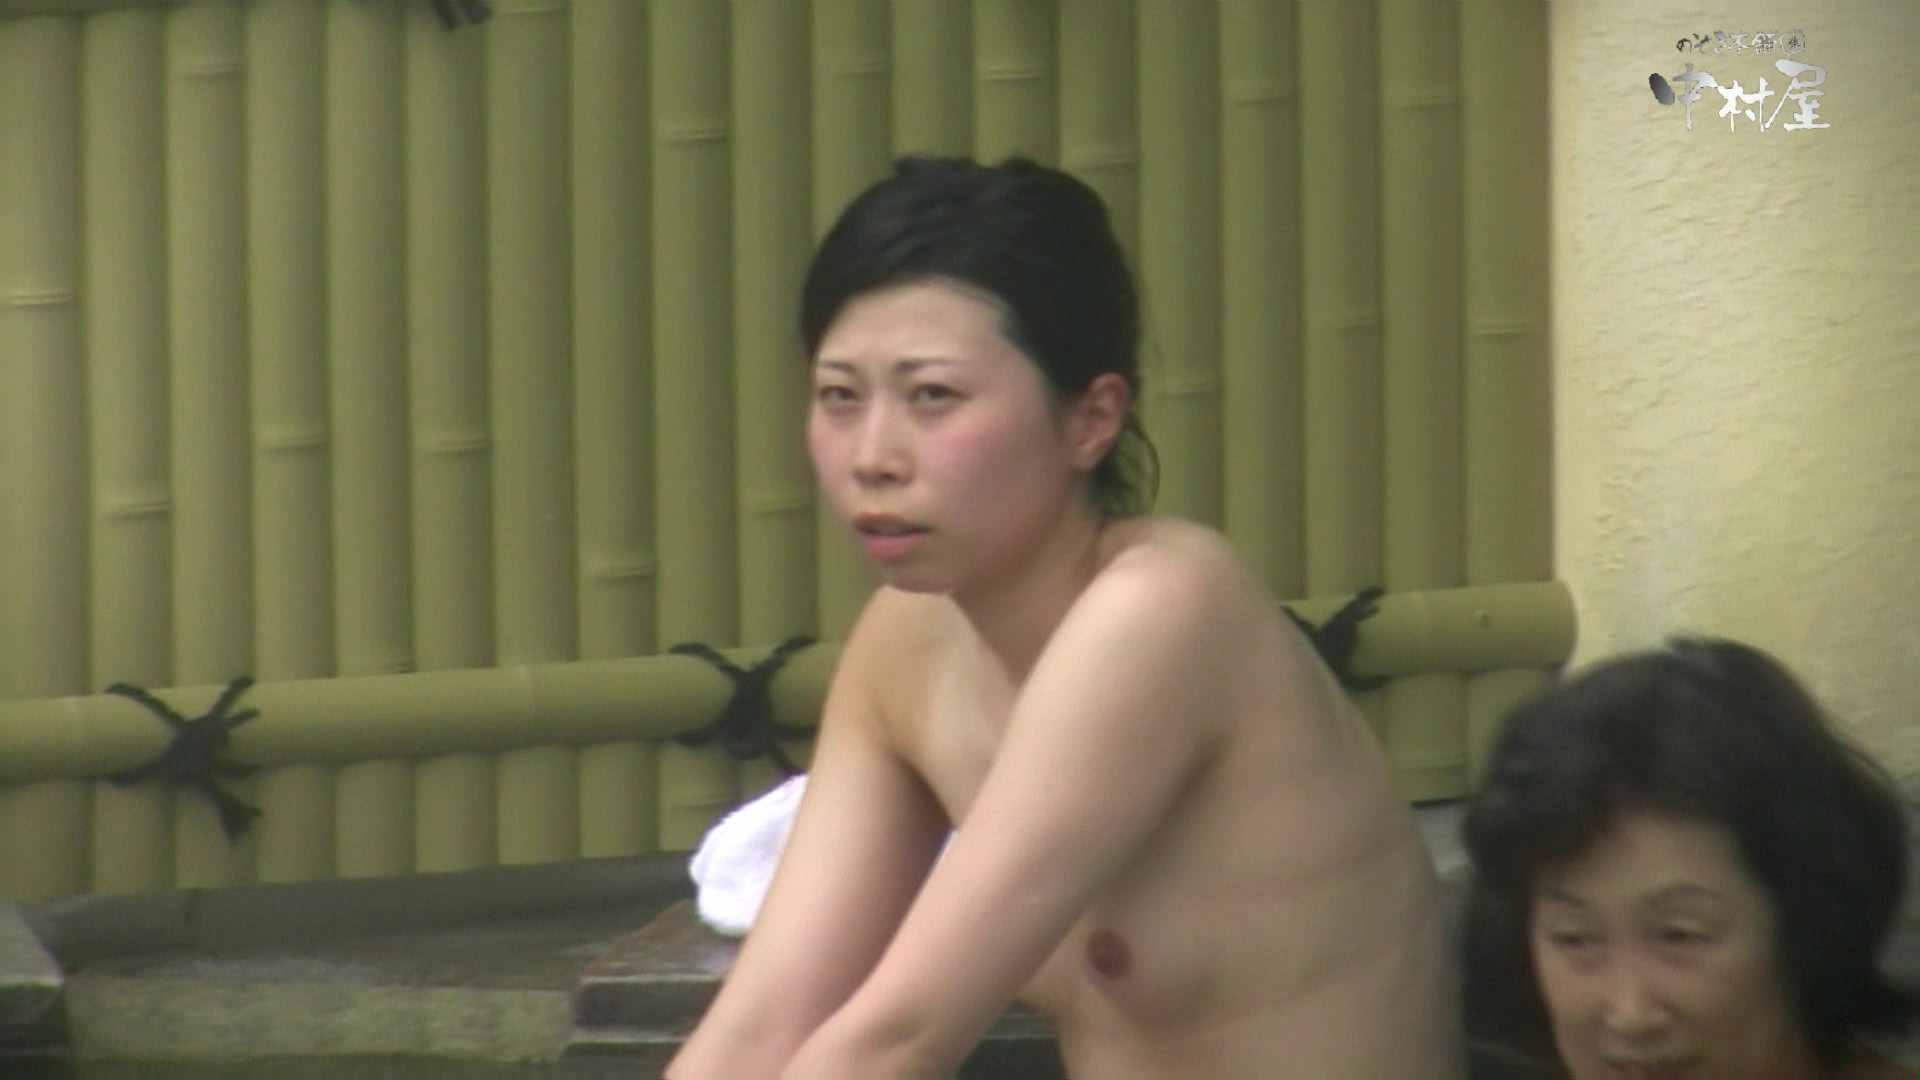 Aquaな露天風呂Vol.891 0 | 0  69連発 35